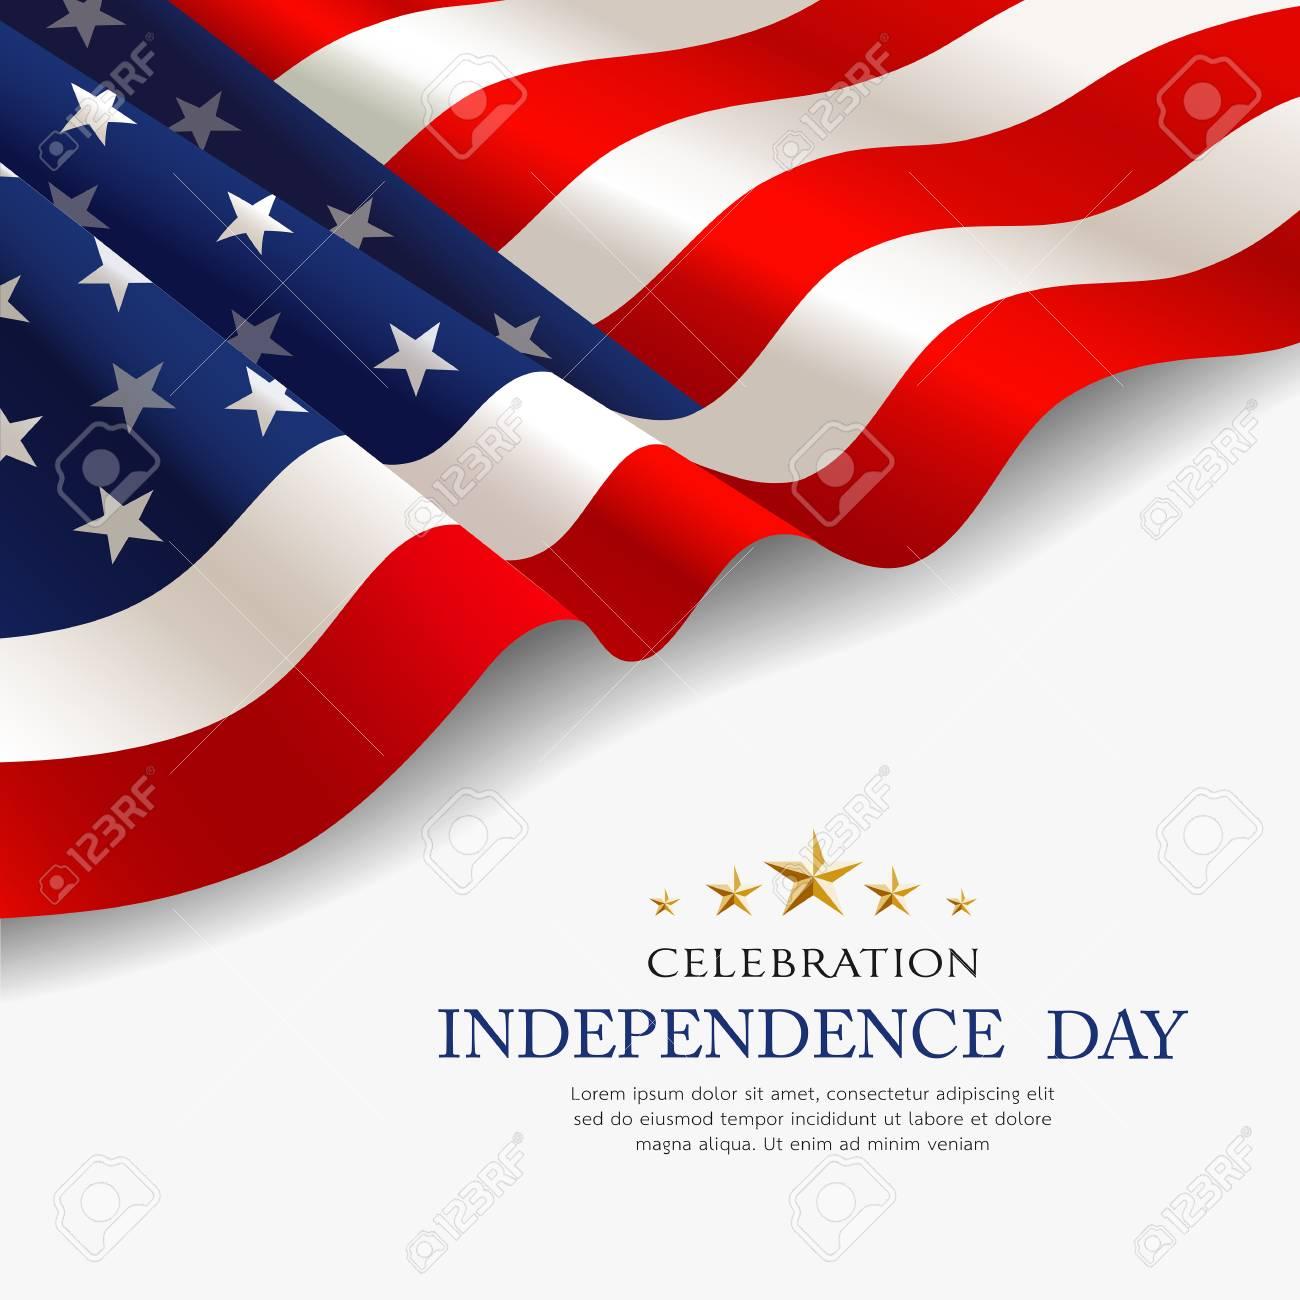 Celebration flag of america independence day fabric design - 125457574